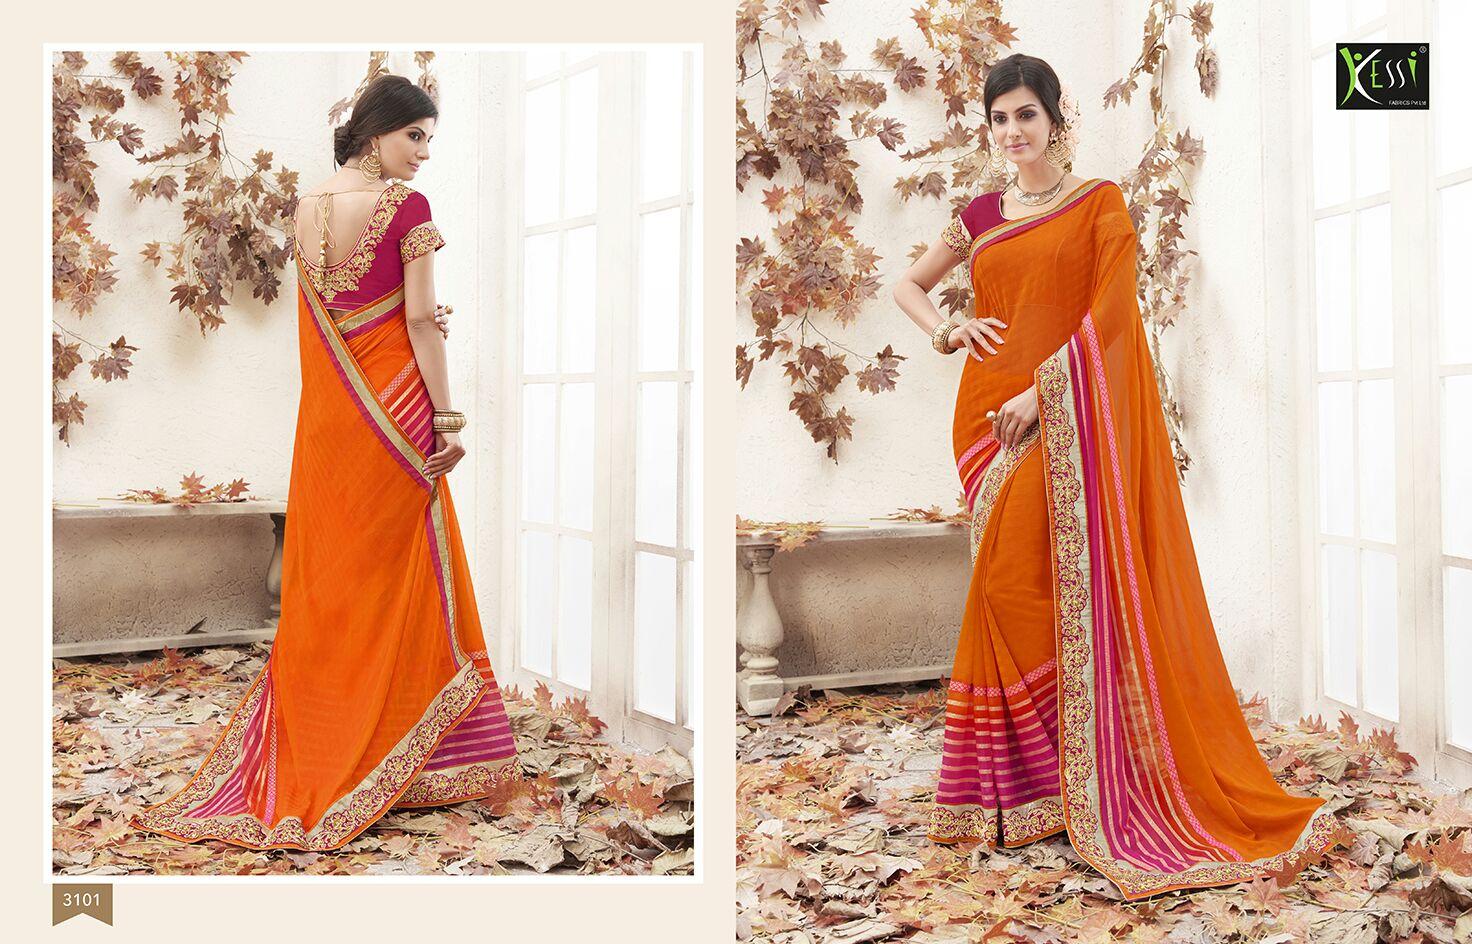 Jhanvi – Designer Saree With Zari,Thread Embroidery And Hand Work